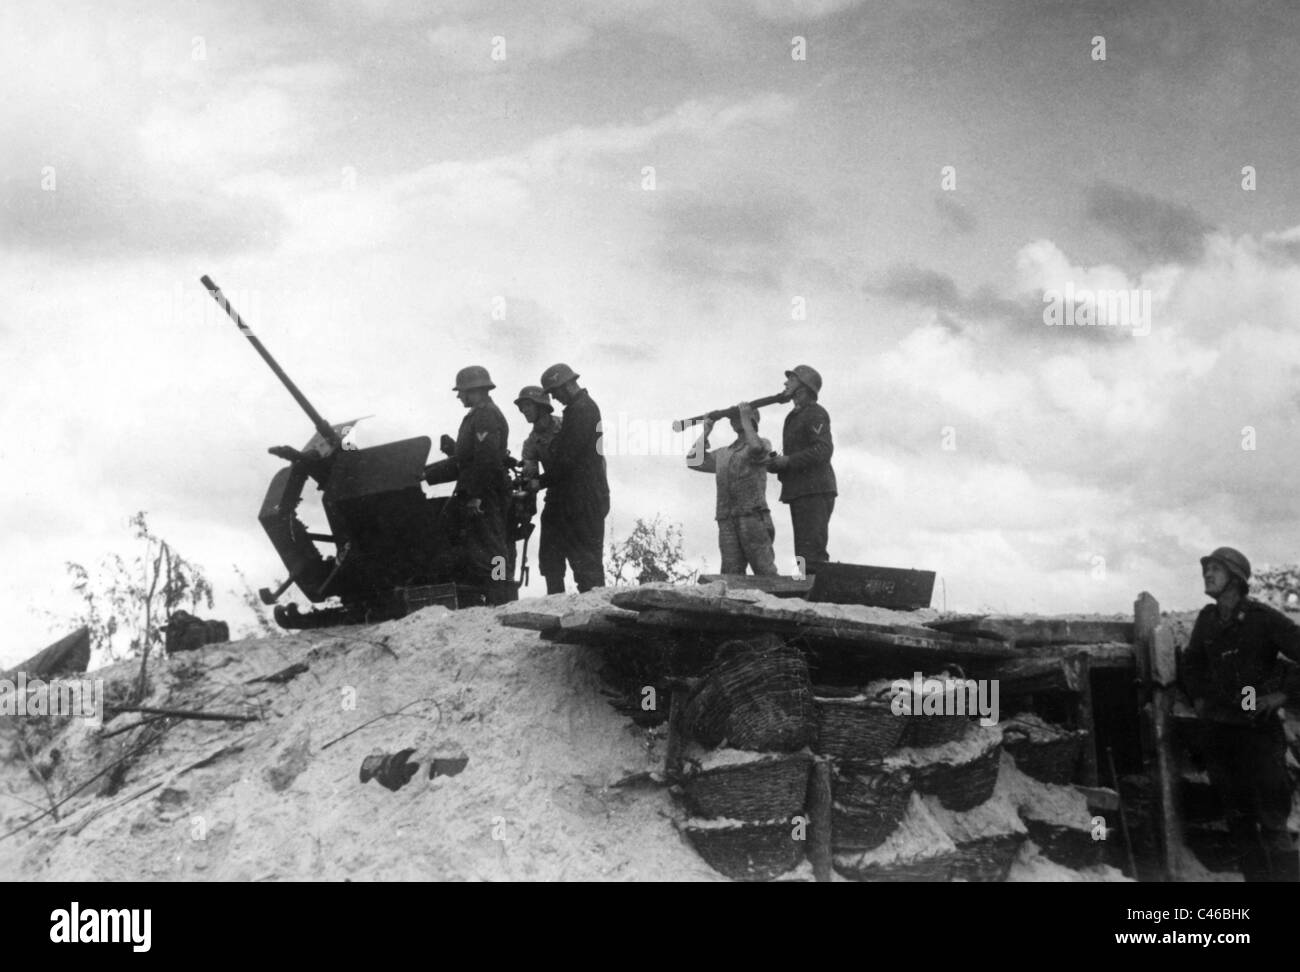 La seconda guerra mondiale, tedesco la difesa aerea: 2 cm inesplosi Immagini Stock